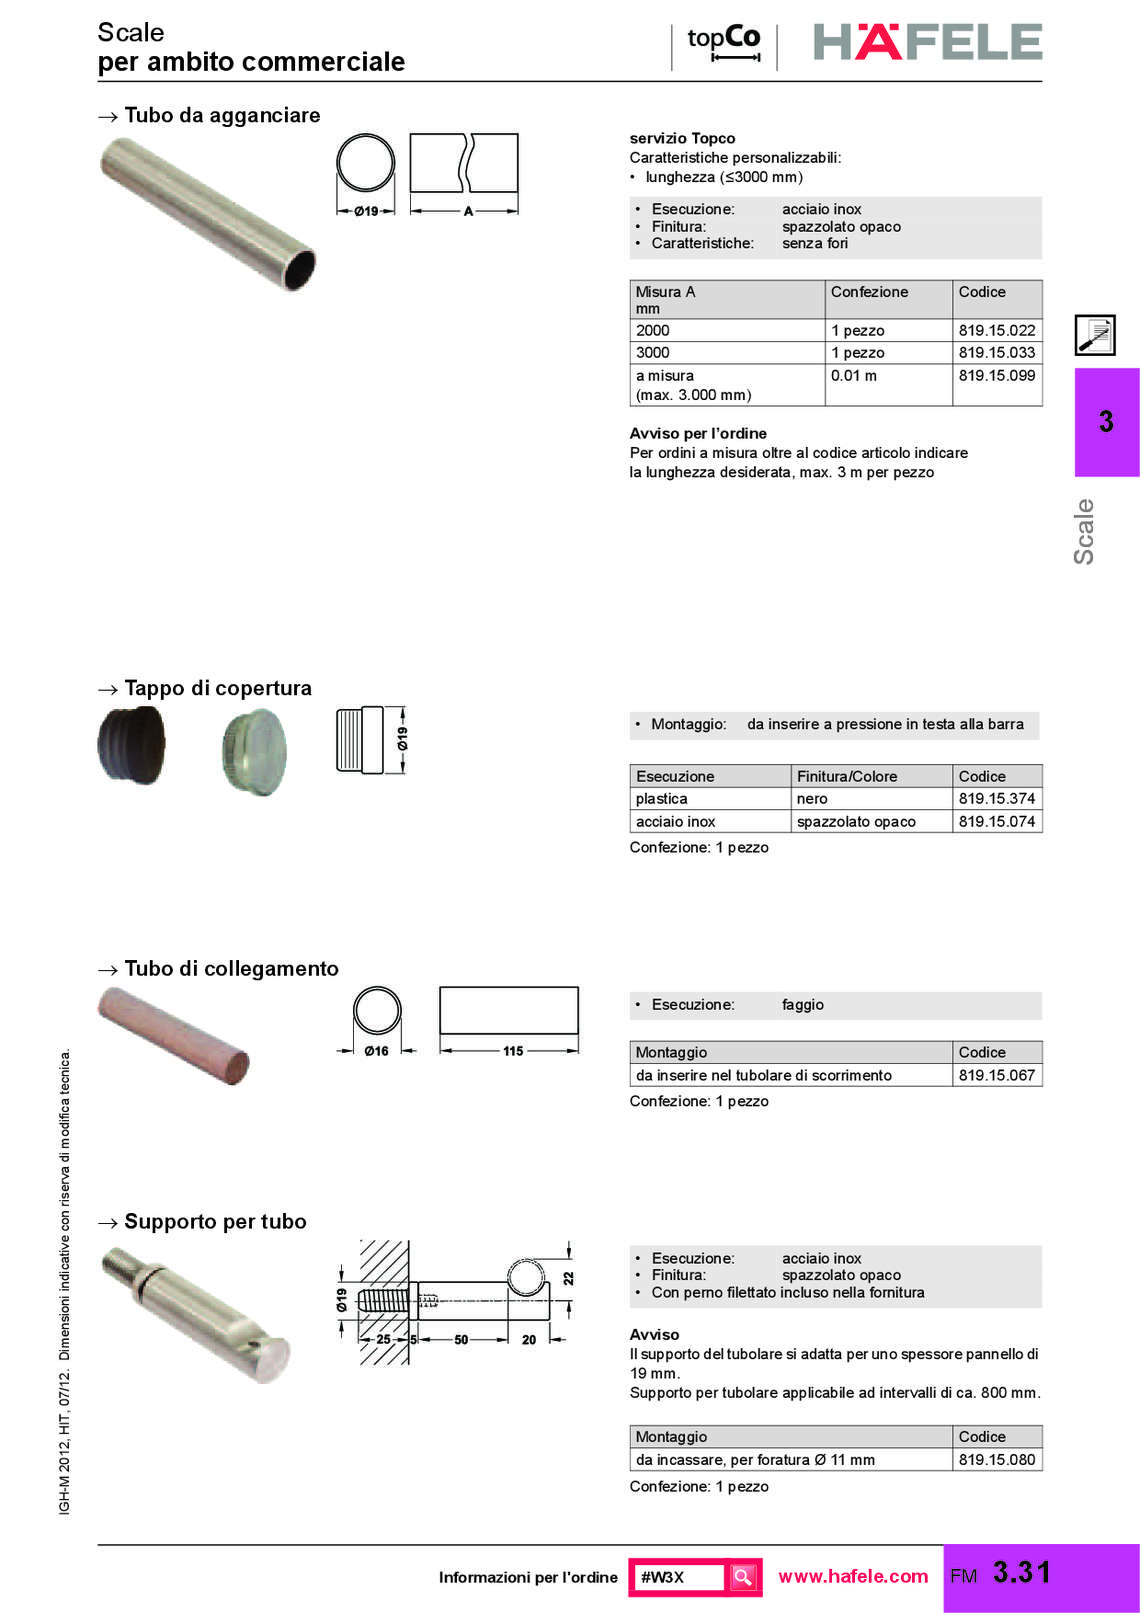 hafele-prodotti-su-misura_81_044.jpg